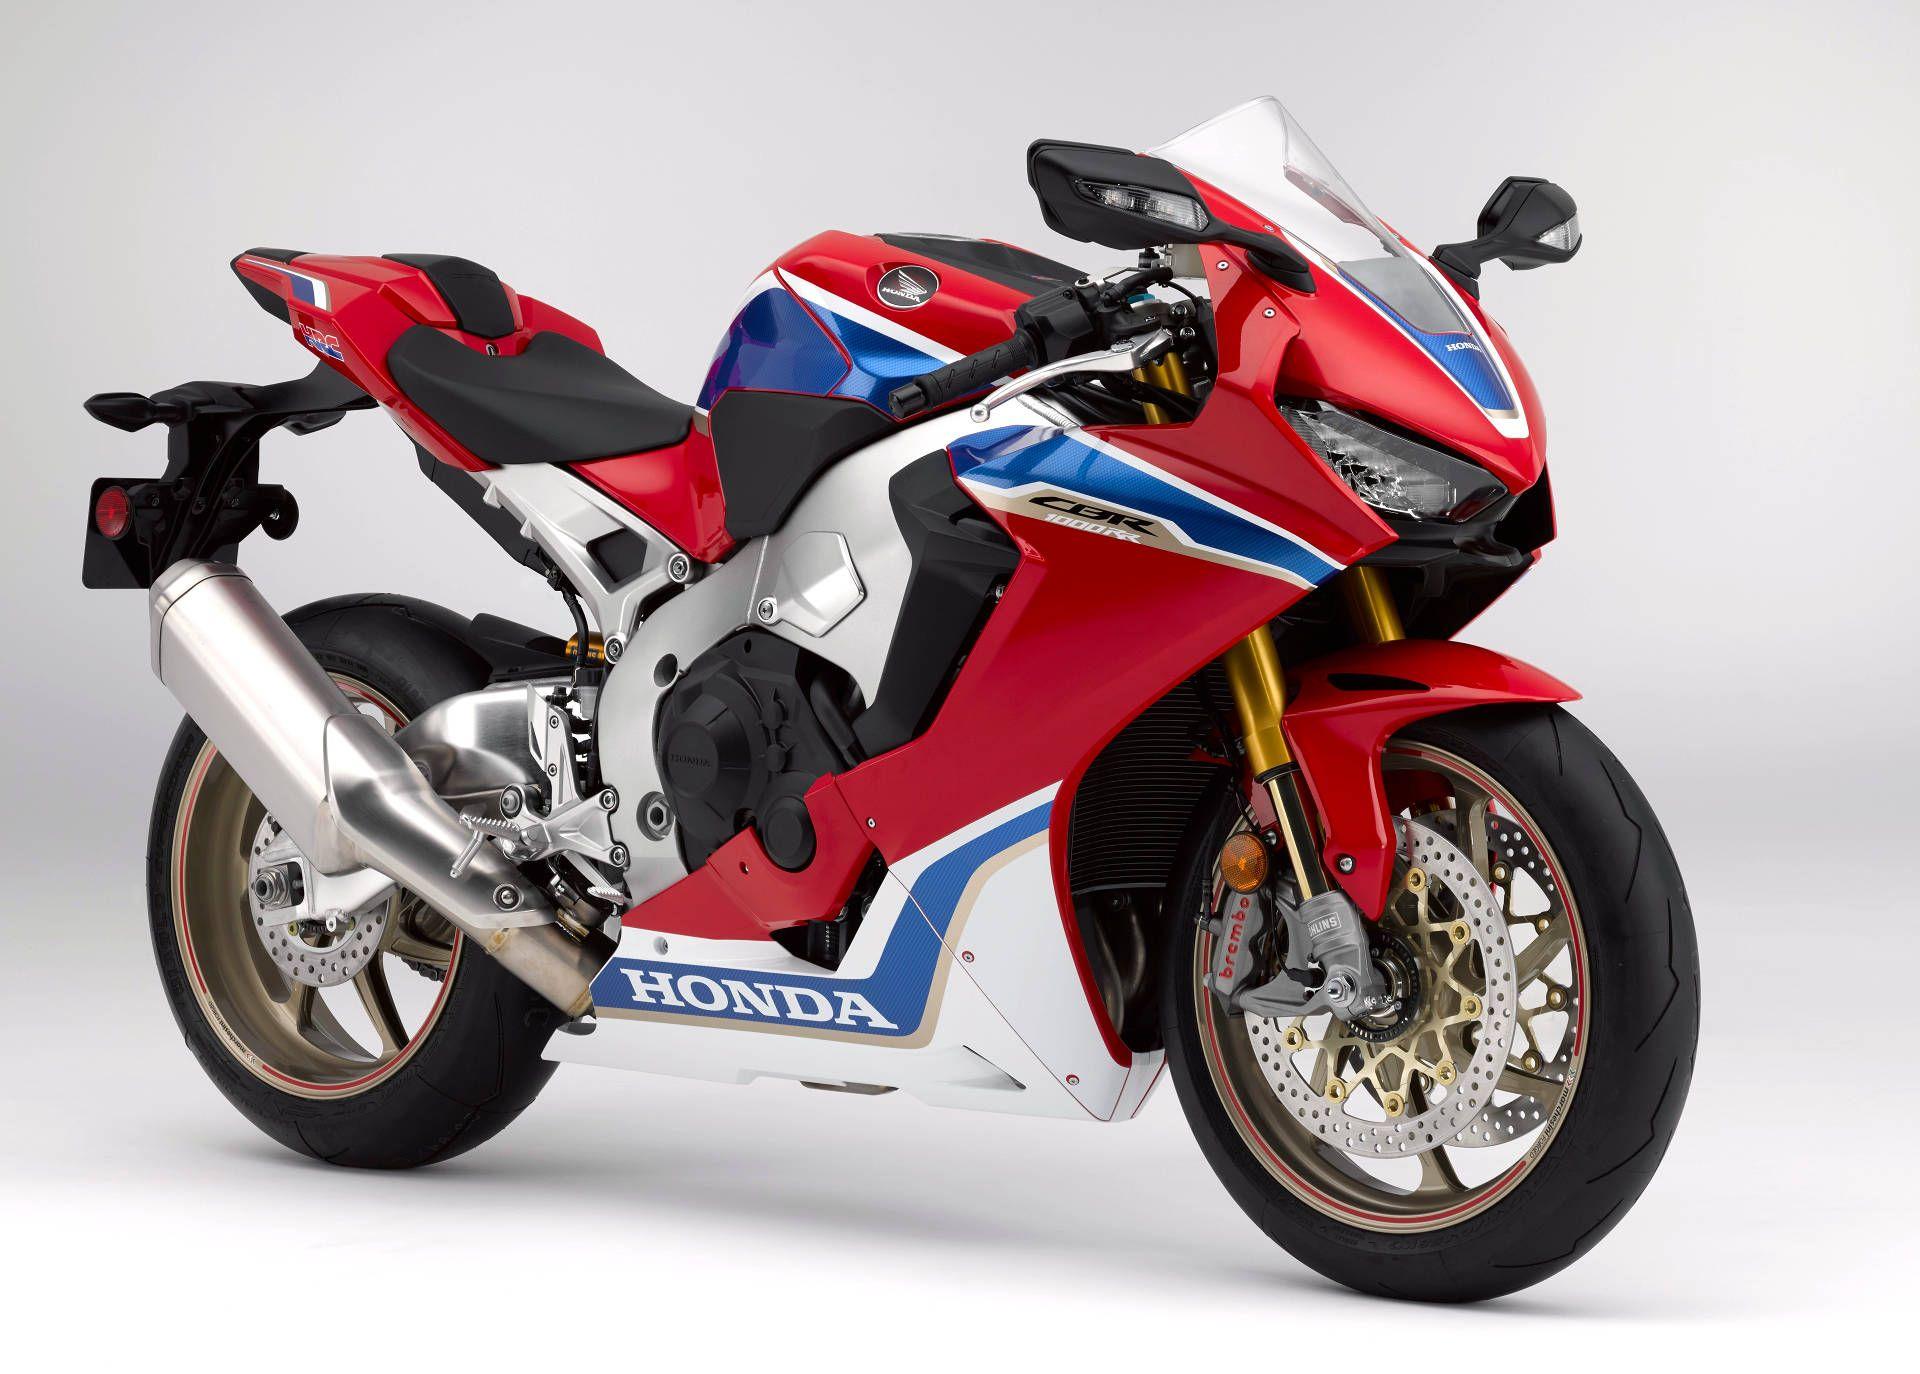 Honda cbr 2014 sports super sports bike photo - Honda Cbr 1000rr Honda Motorcycles Facts Motorcycle News Motorcycle Design Motogp The O Jays Super Sport Super Car